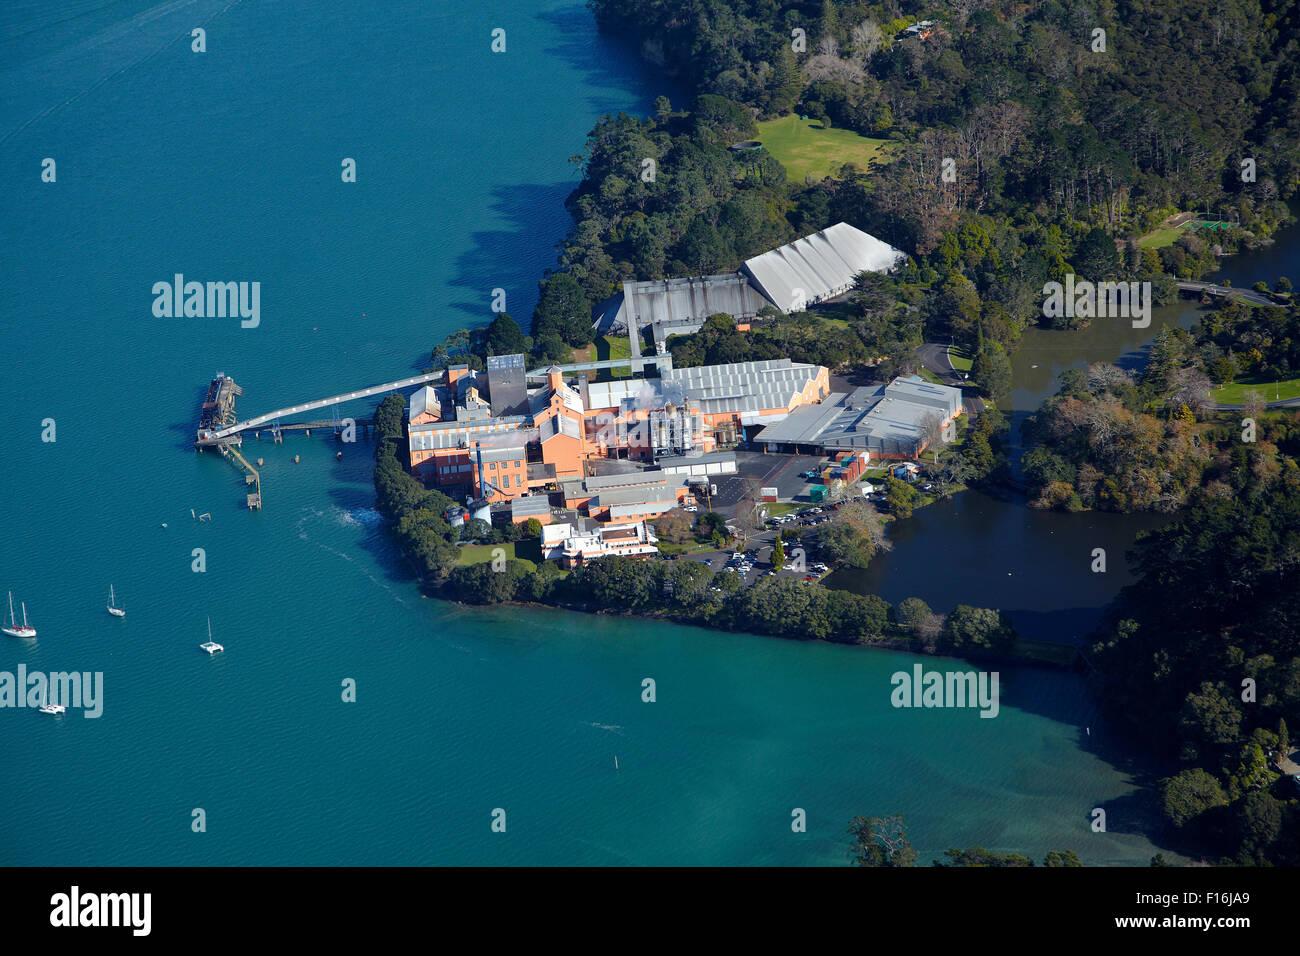 Chelsea Sugar Refinery, Birkenhead, Auckland, North Island, New Zealand - aerial - Stock Image